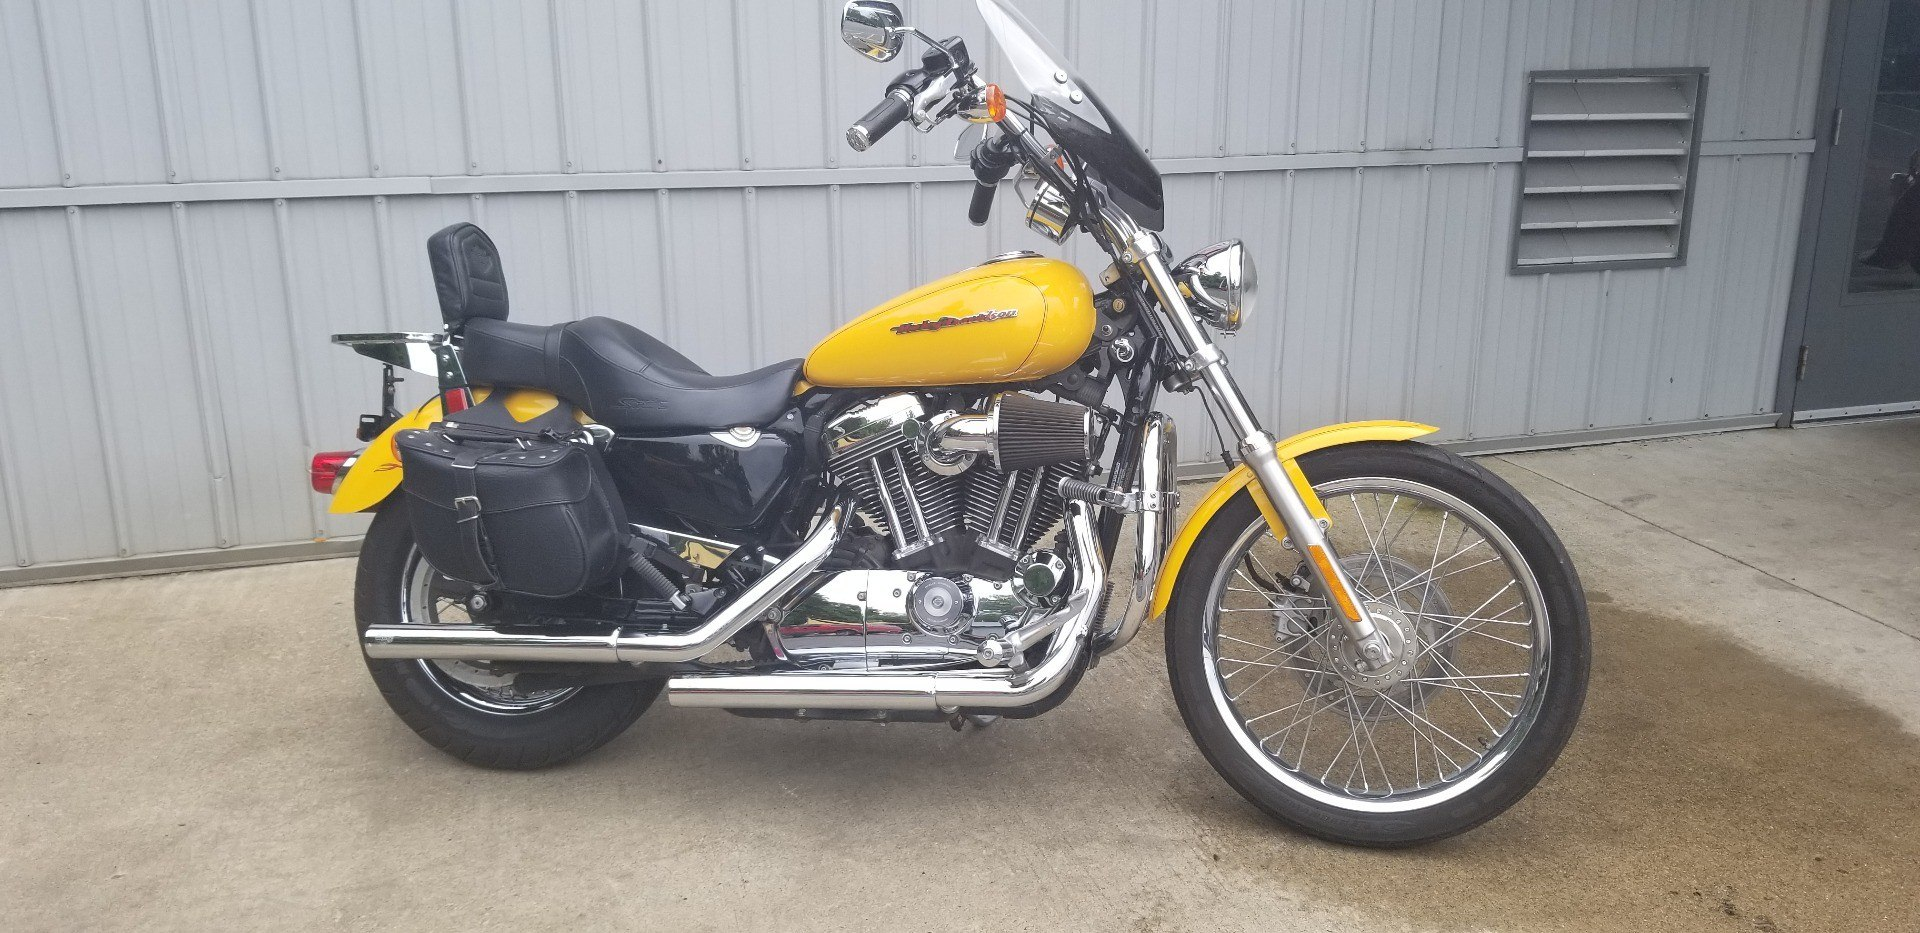 2007 Harley-Davidson Sportster 1200 Custom for sale 59857